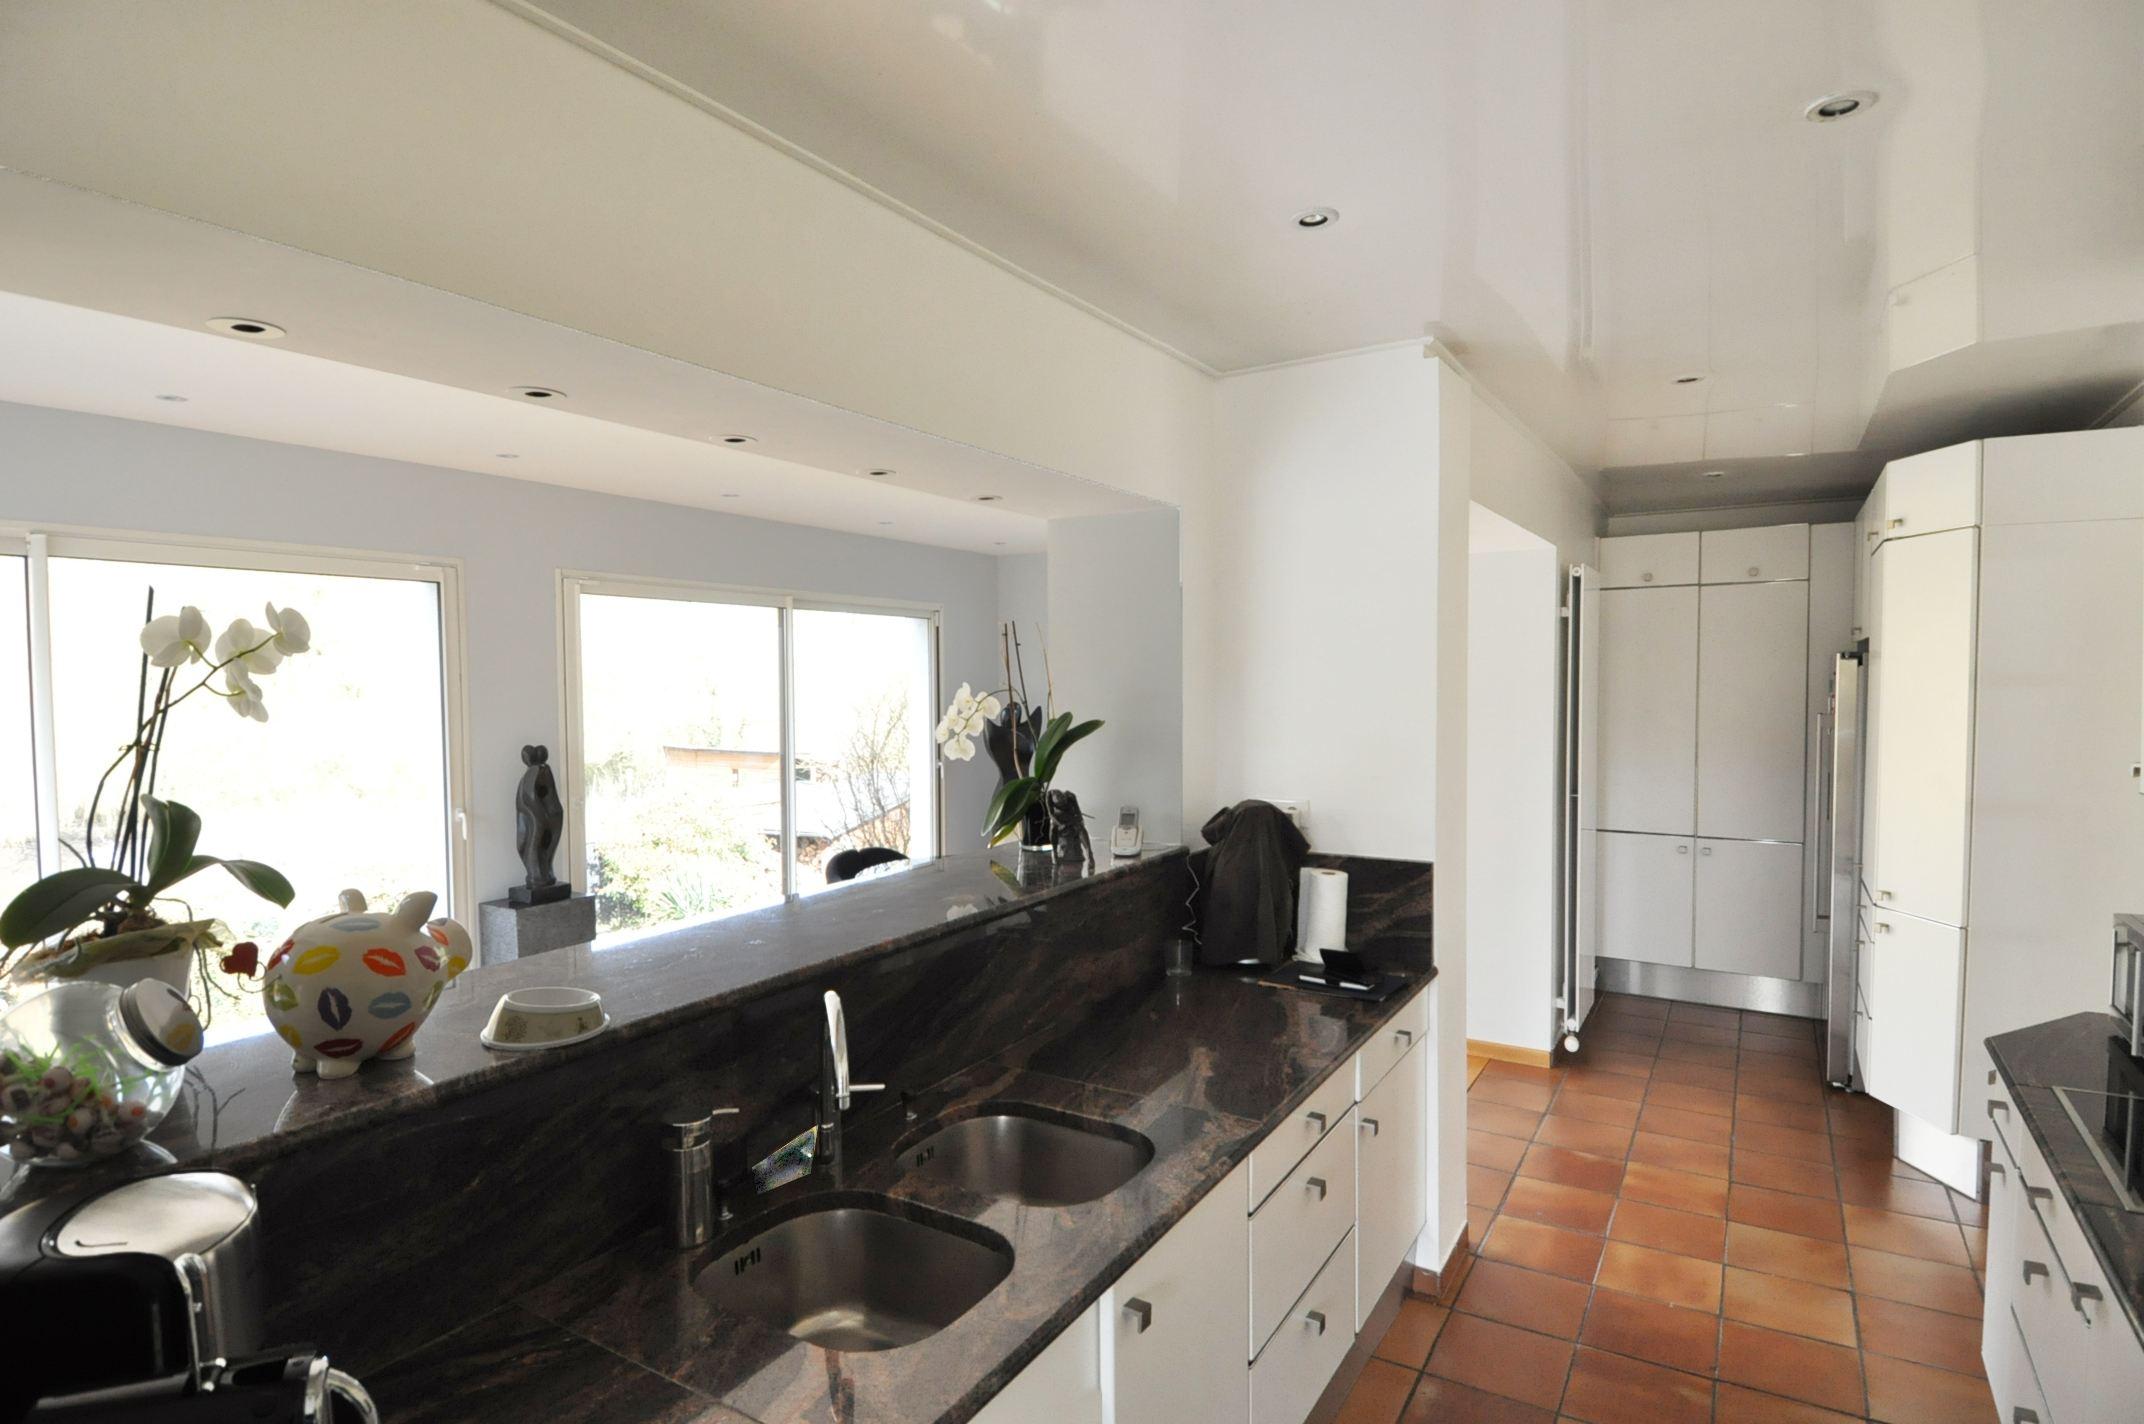 Property For Sale at LAMBERSART 3 km, luxurious family villa 270 m² hab. on 1 ha